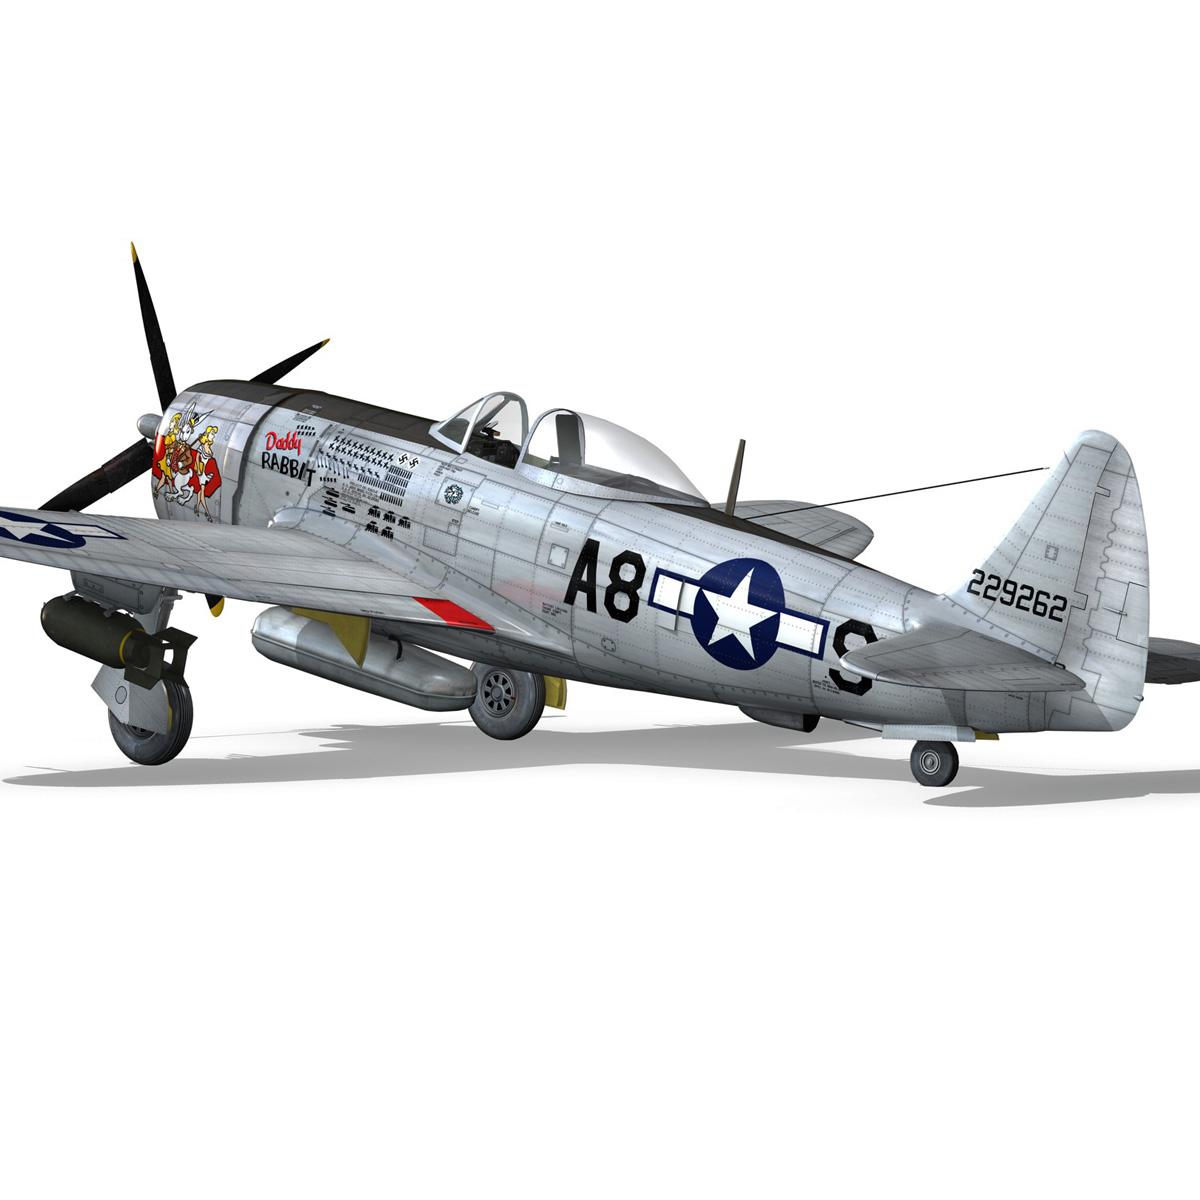 republic p-47 thunderbolt – daddy rabbit 3d model fbx c4d lwo obj 272698